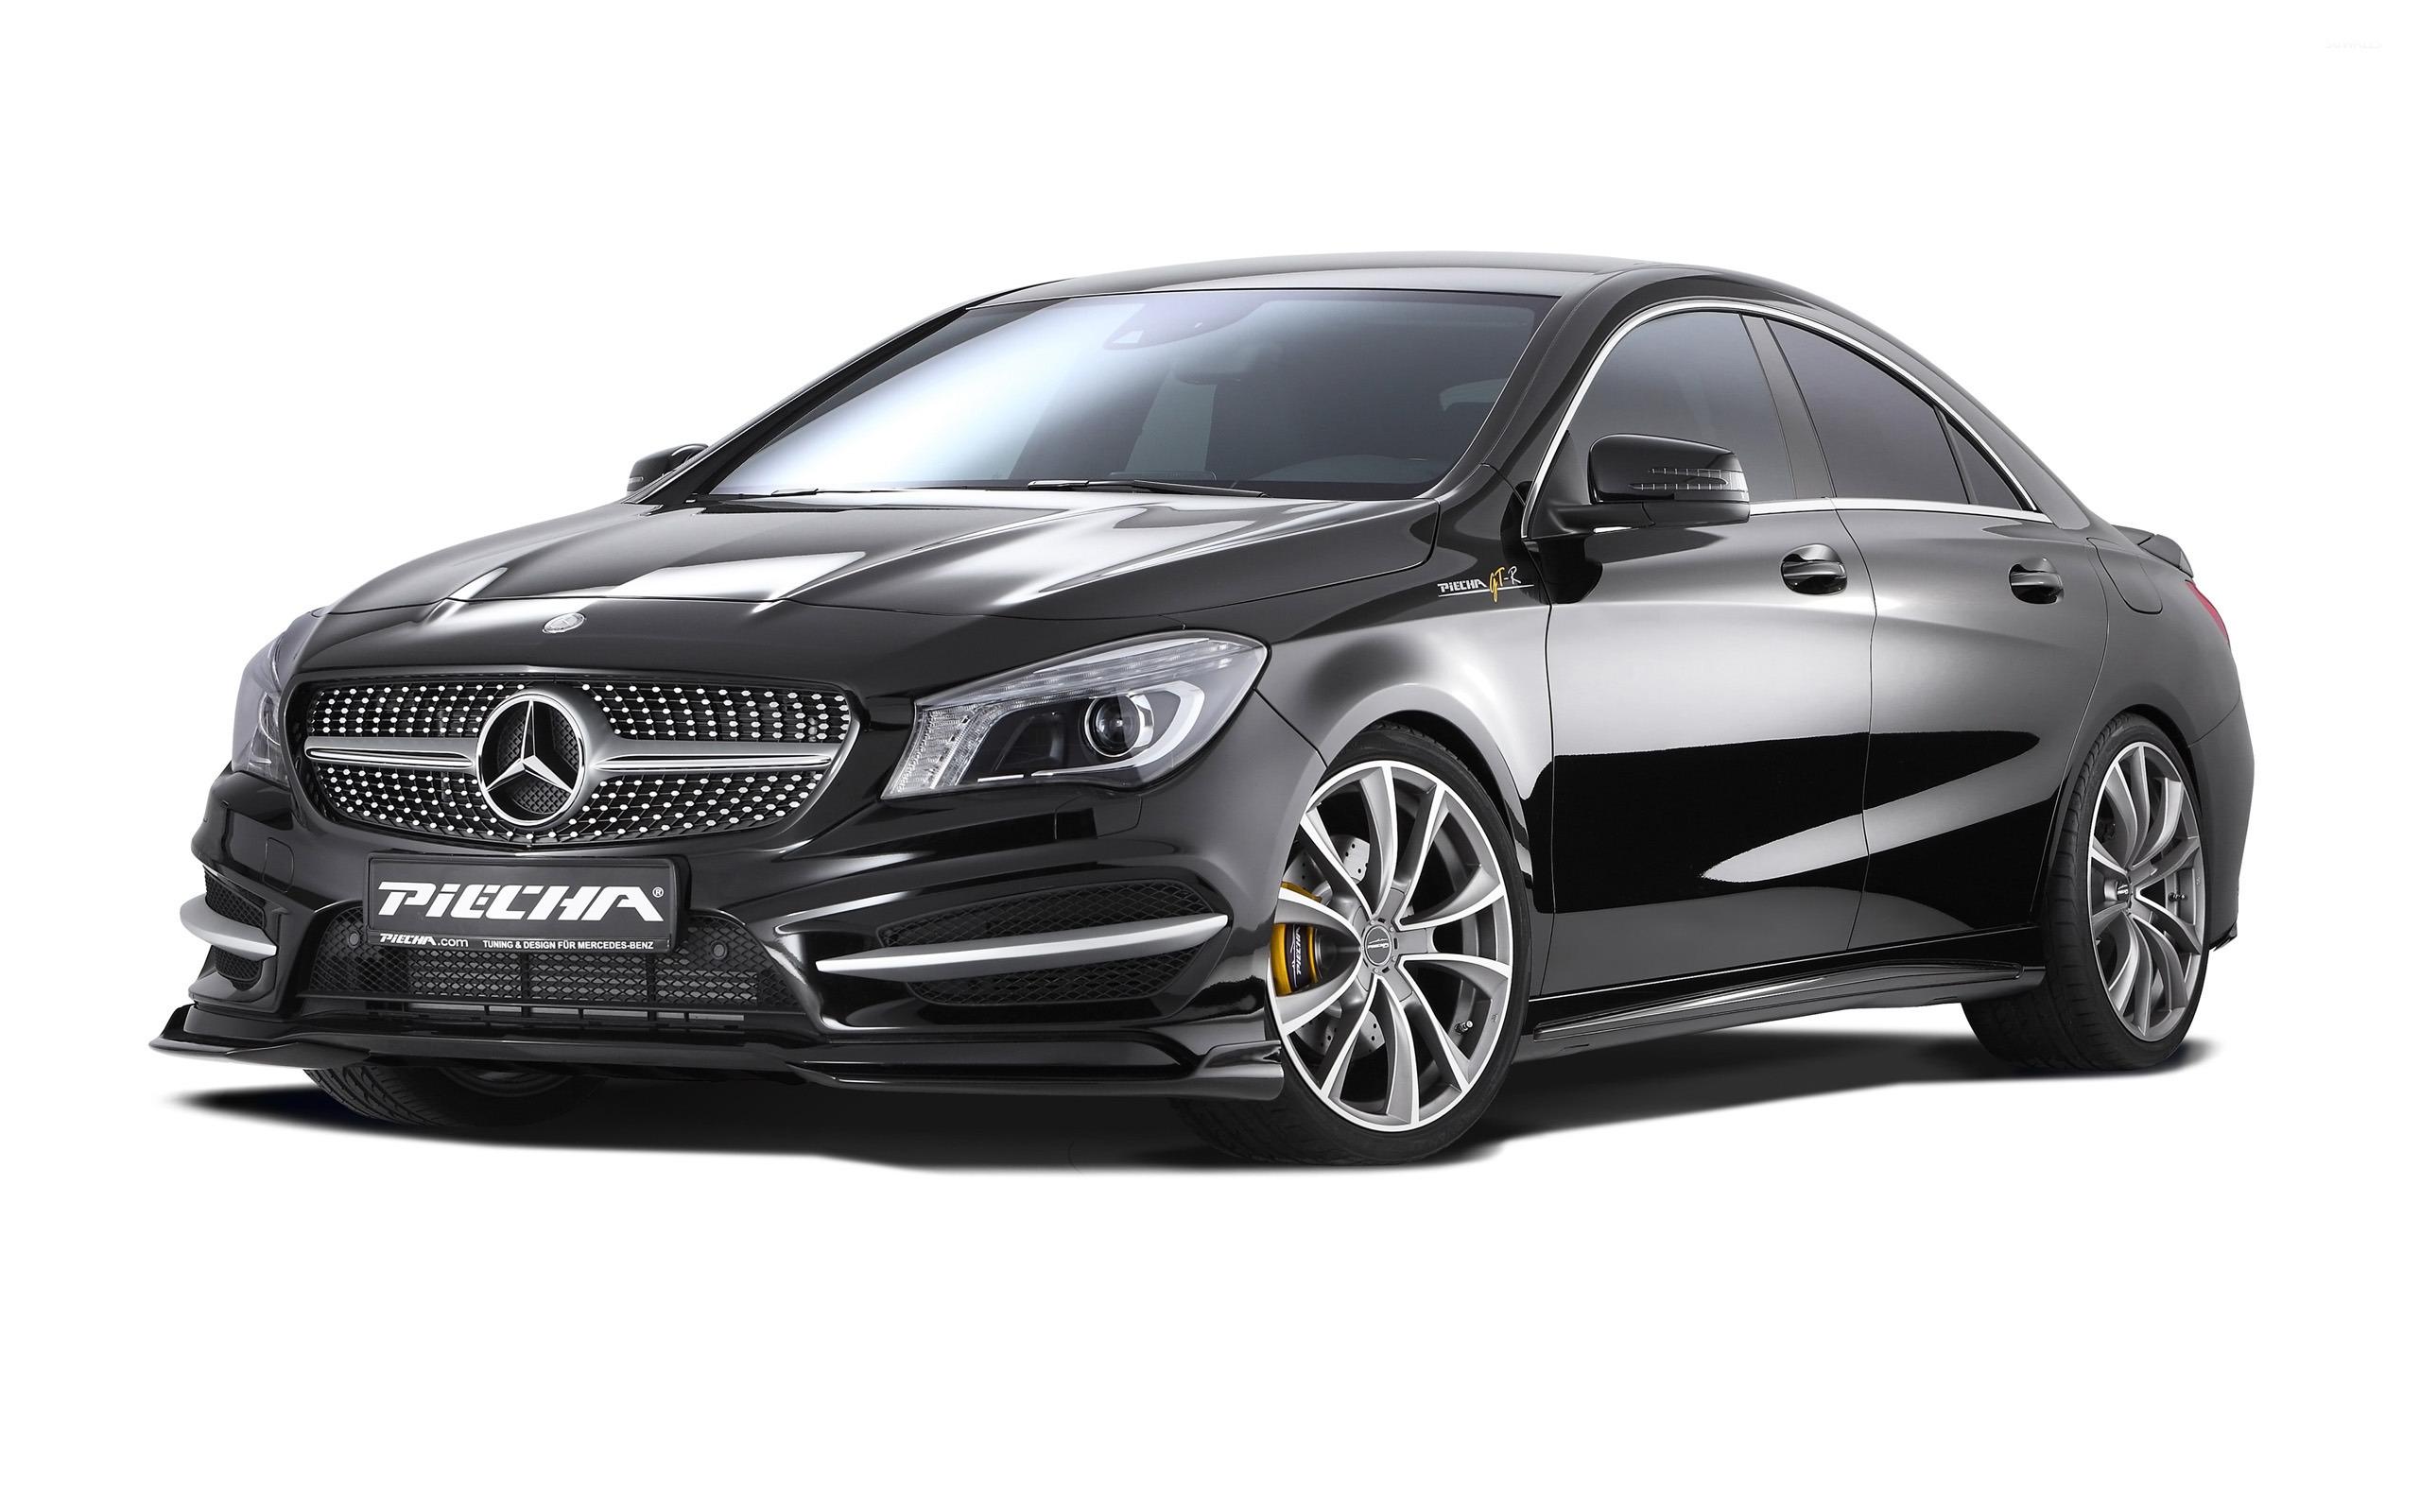 2013 piecha design mercedes benz cla gt r wallpaper car for 2013 cla mercedes benz